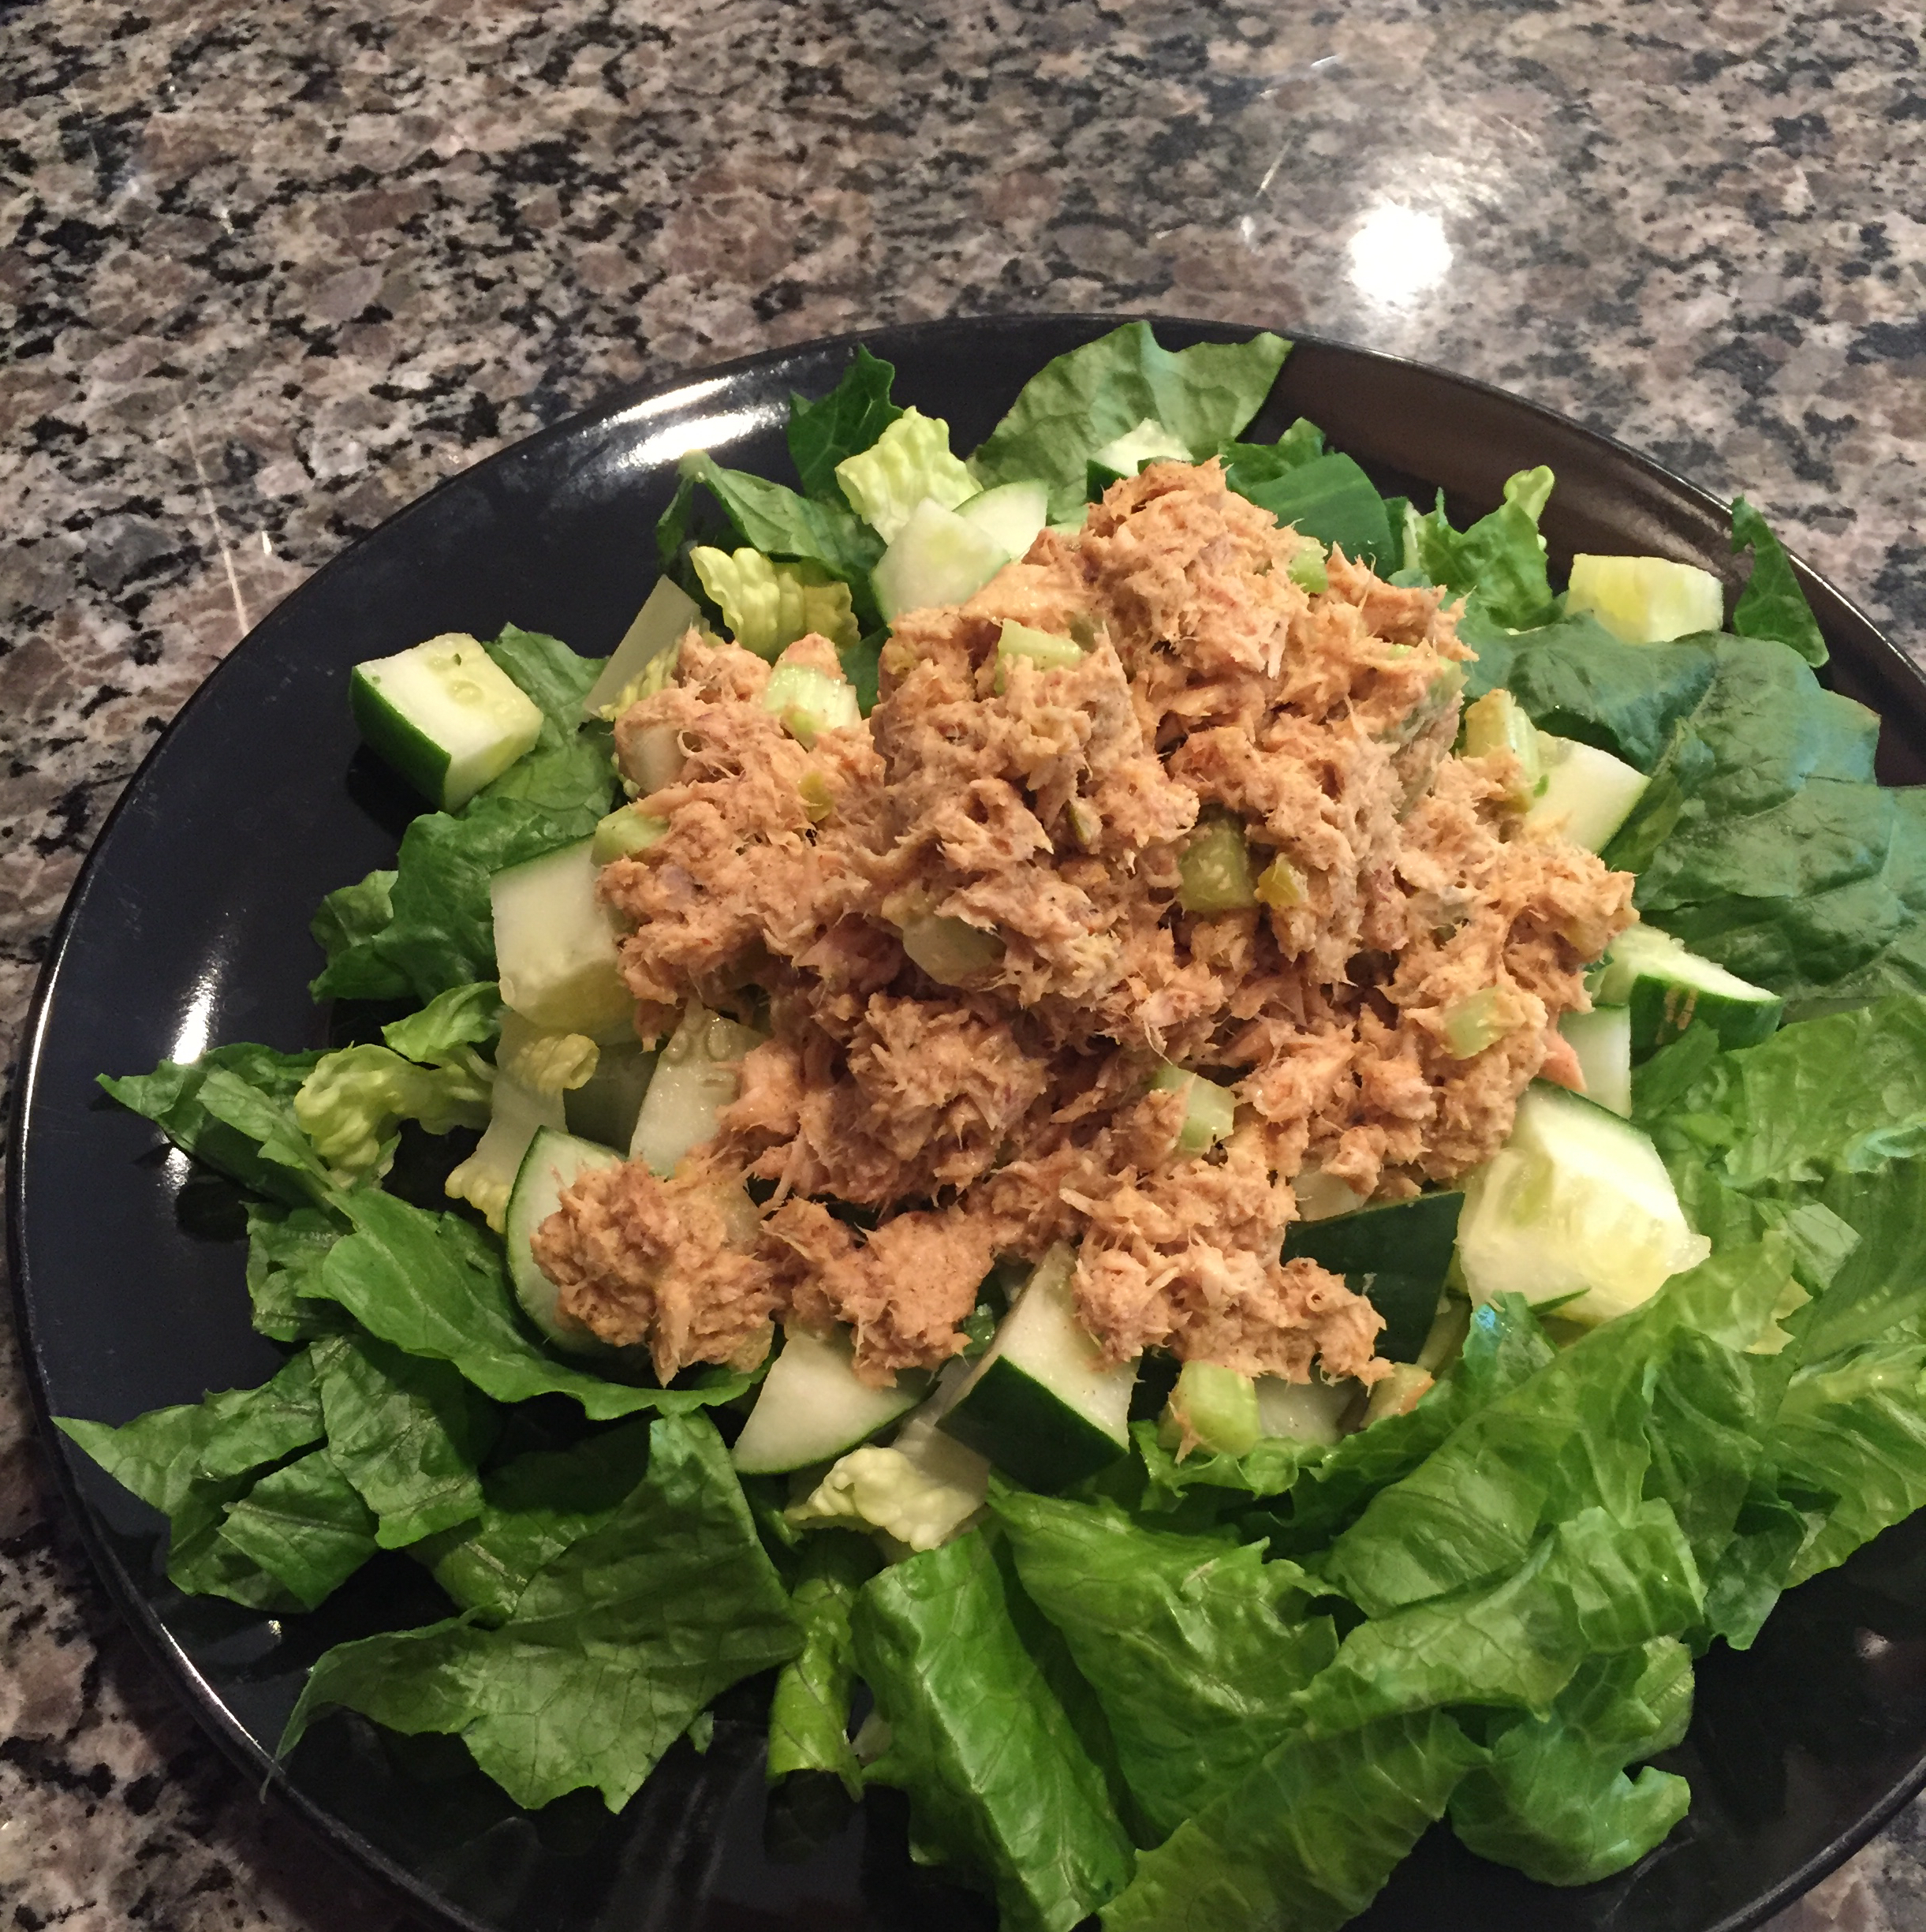 Cinnamon-Curry Tuna Salad